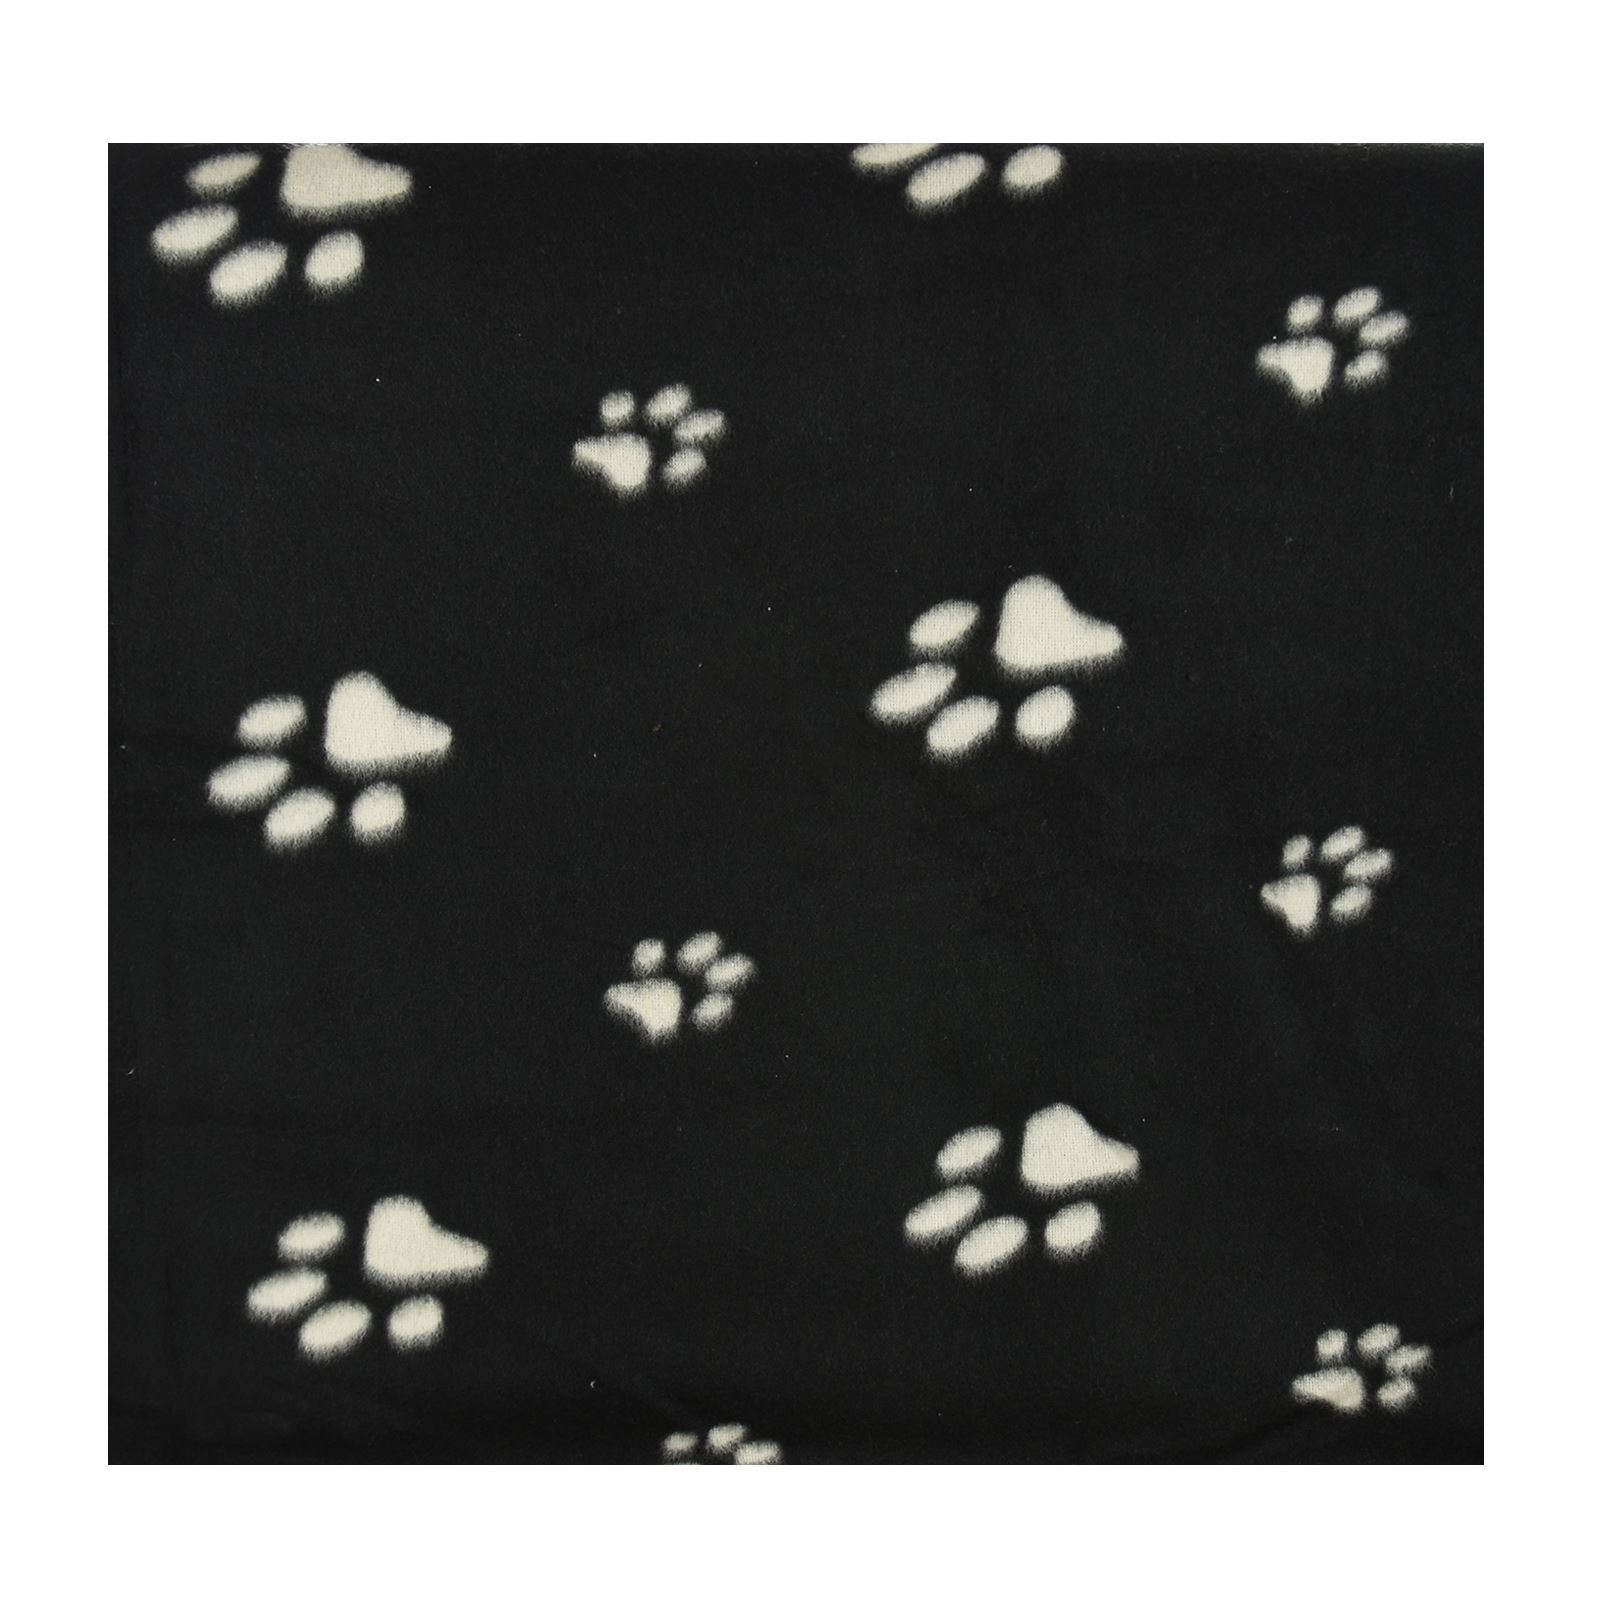 Warm-Pet-Mat-Paw-Print-Cat-Dog-Puppy-Fleece-Soft-Blanket-Bed-Cushion-One-Size thumbnail 6